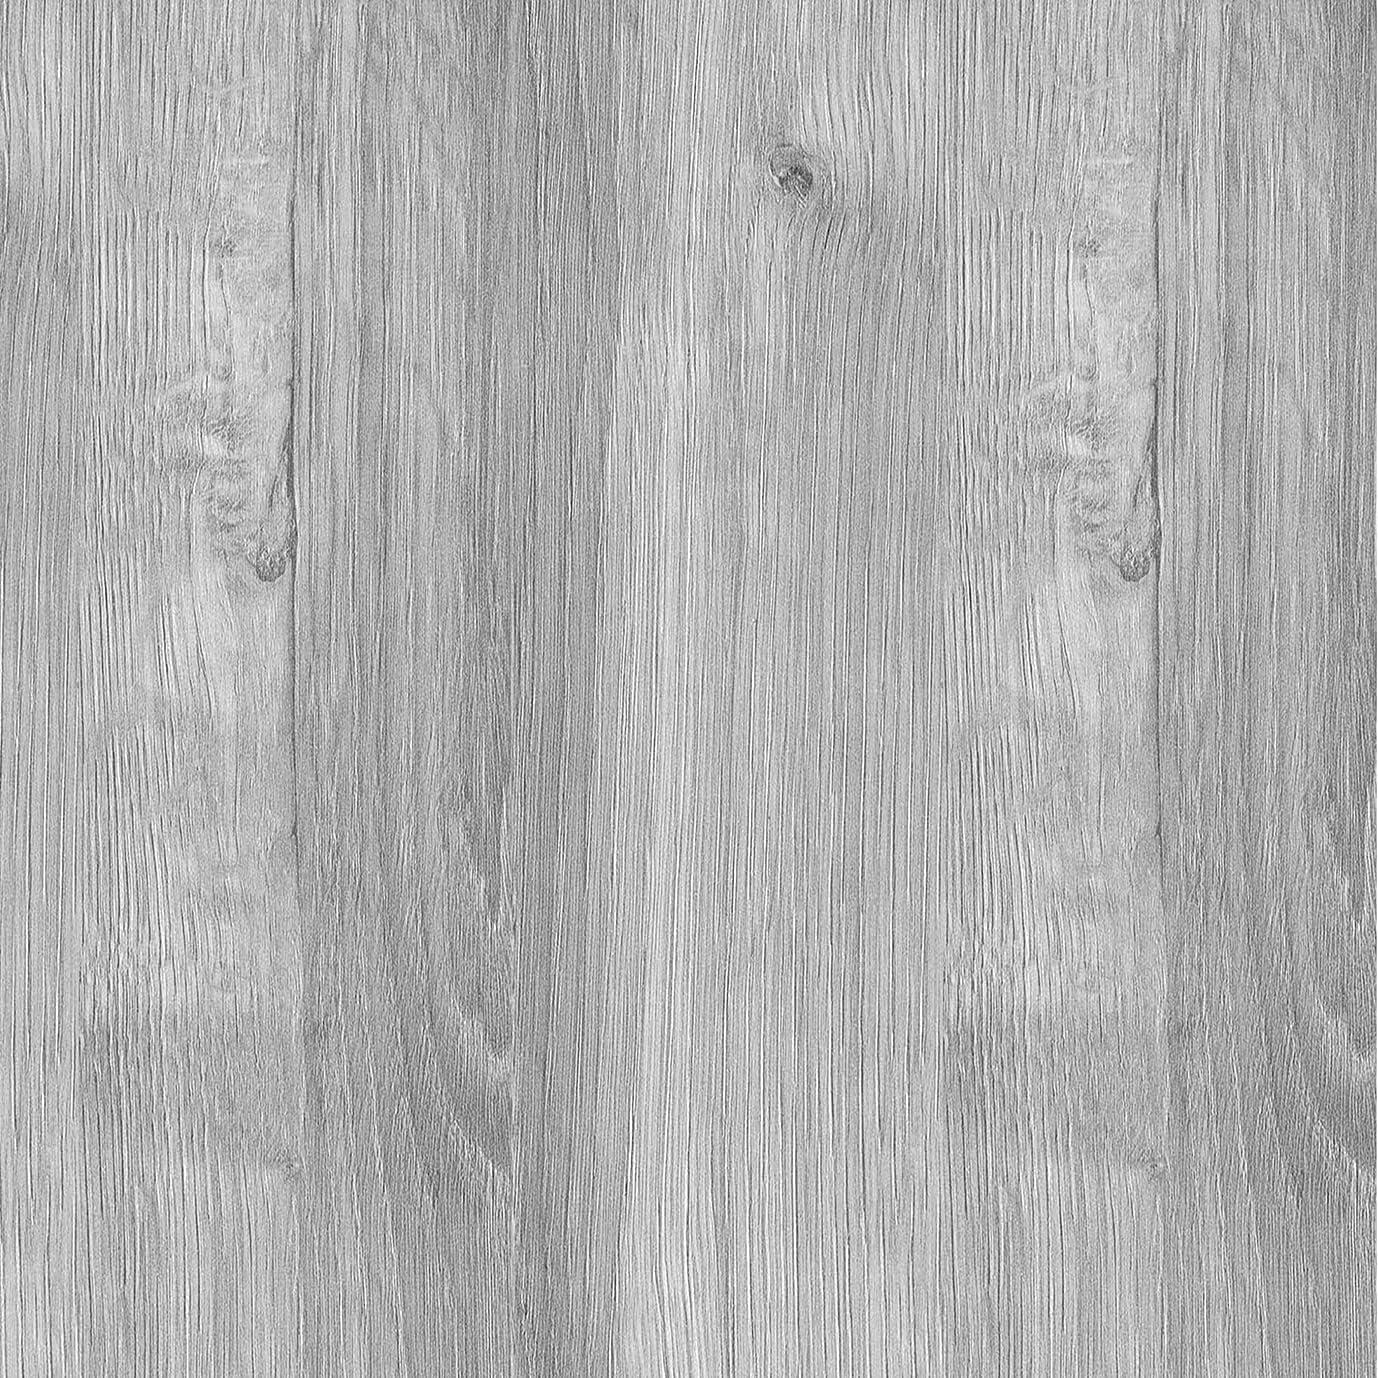 Lámina adhesiva Madera y piedras , vinilos para muebles , lámina decorativa, aspecto real, lámina para muebles, vinilo decorativo (44 x 200 cm, Pino Gris)